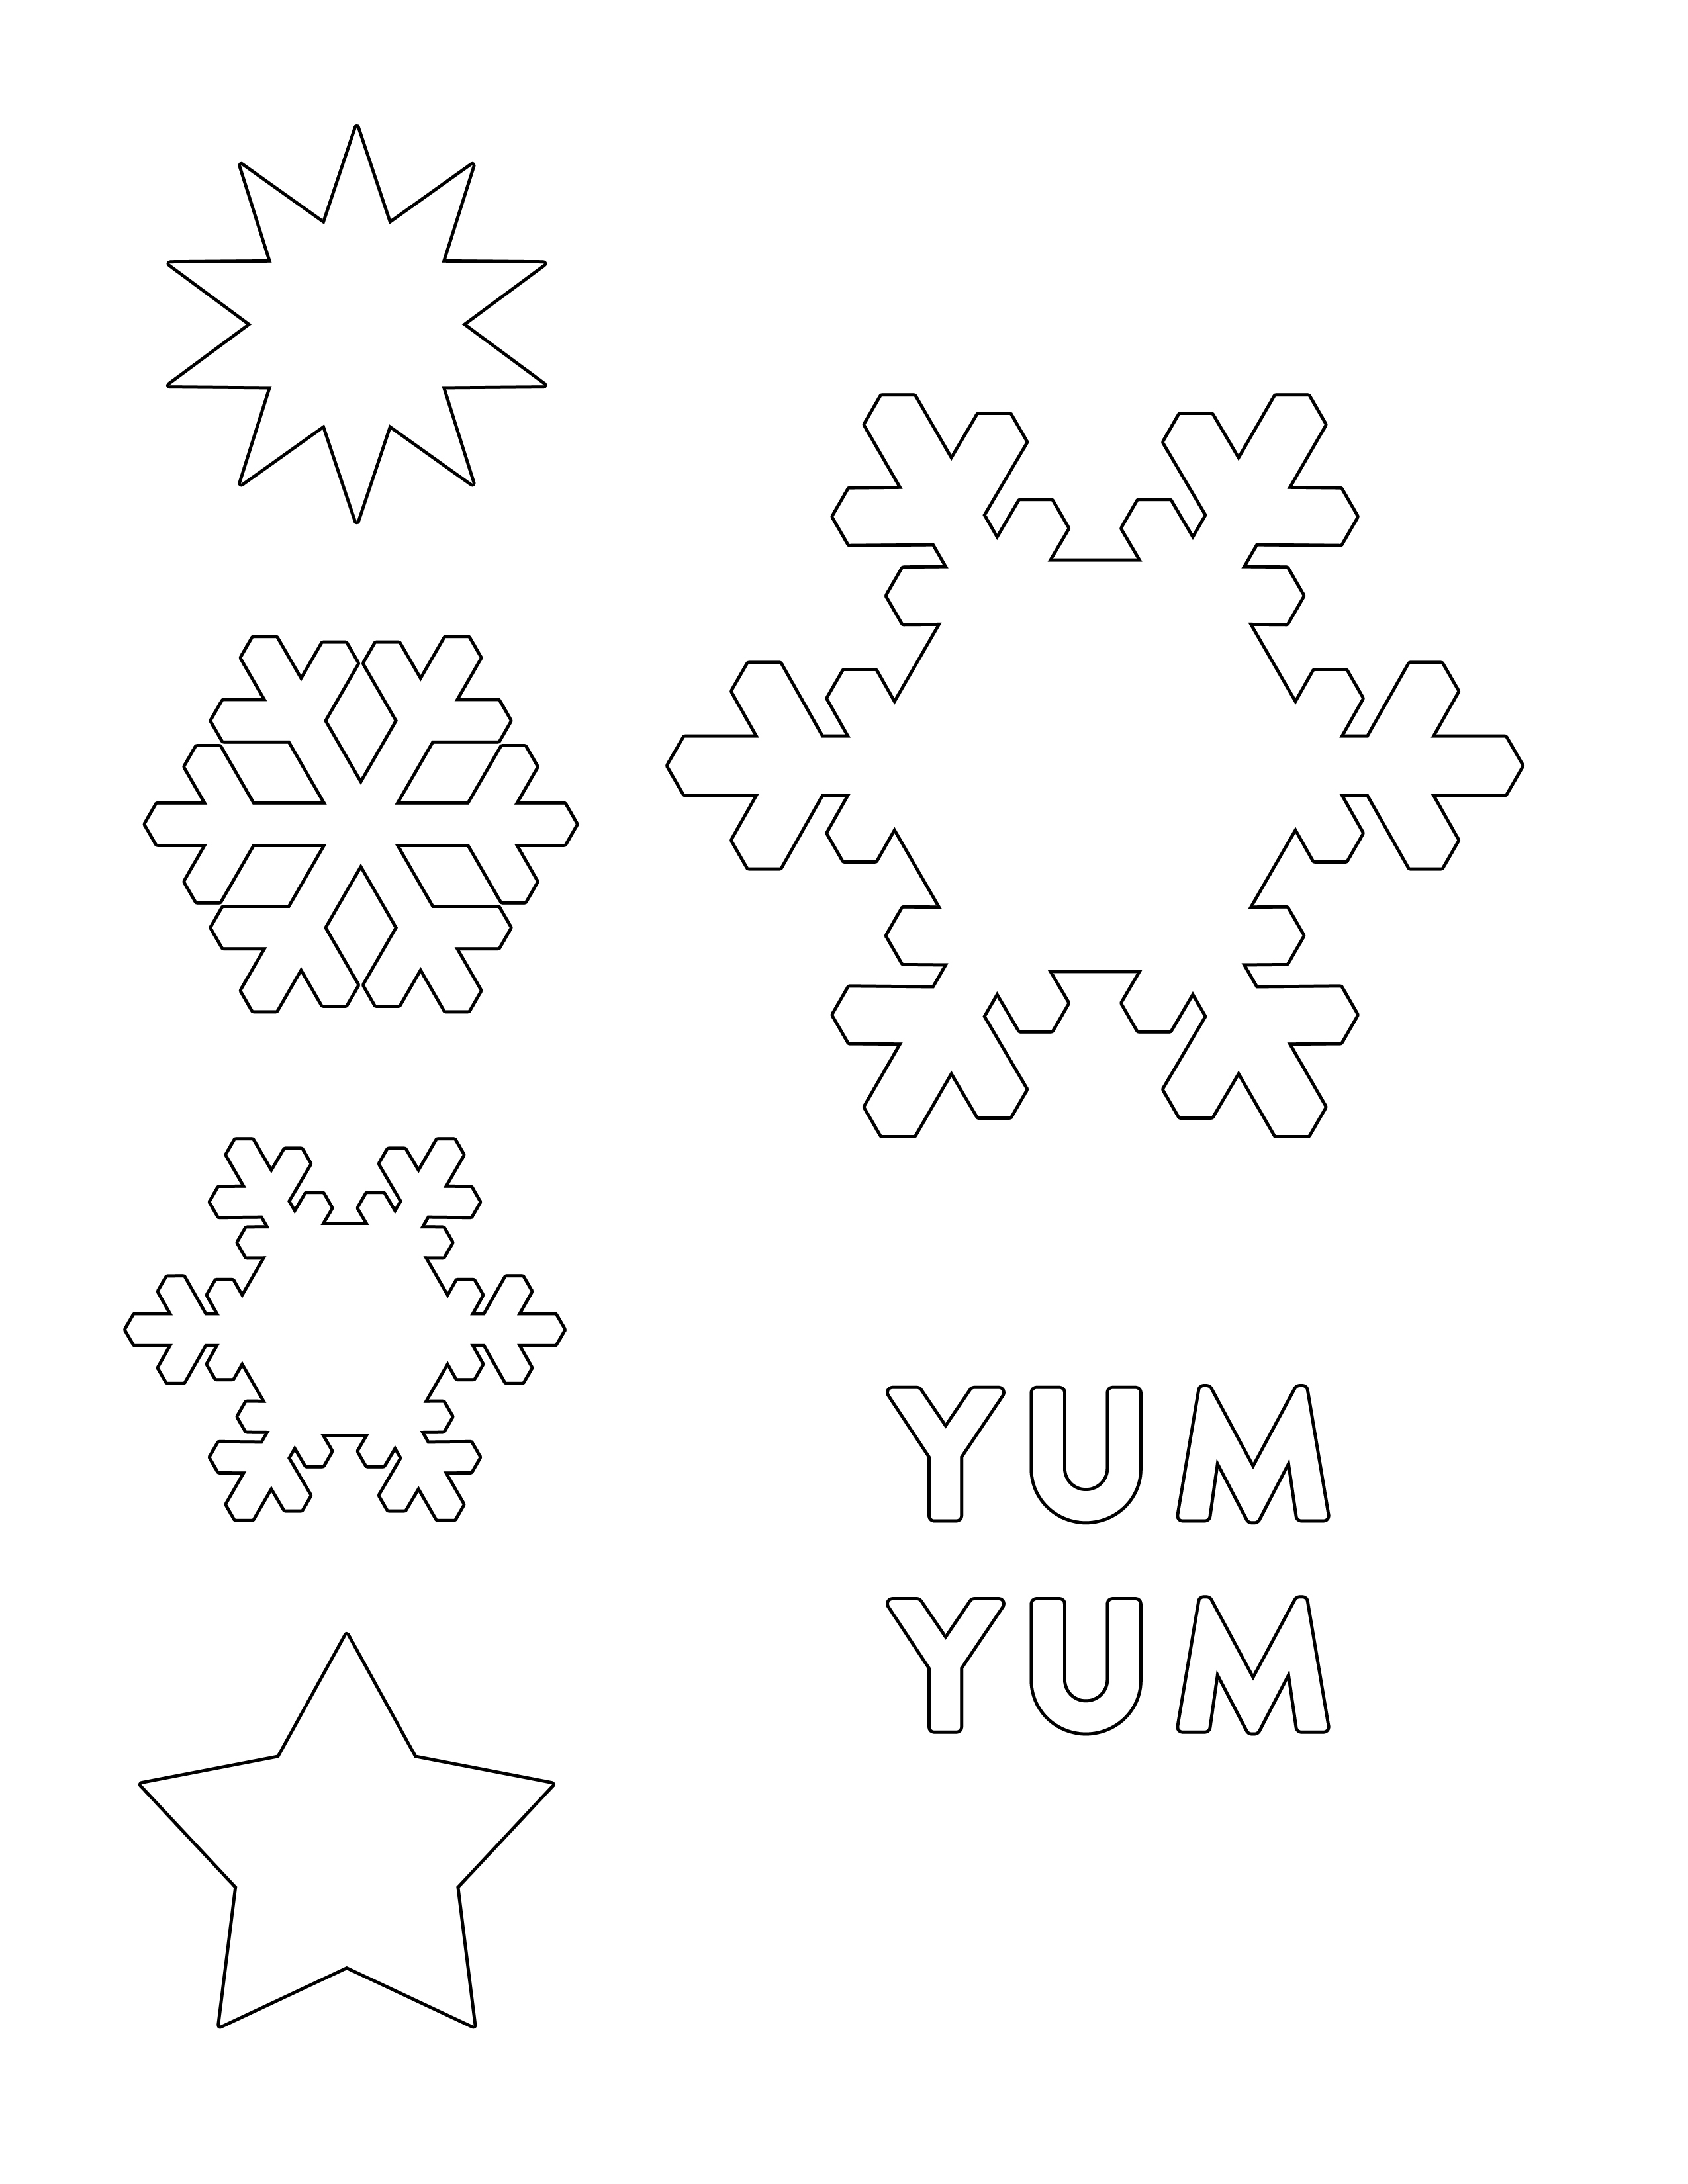 Disney-Frozen-Elsa-Snowflake-Hair-Barrettes-Printable-0813 - Disney - Snowflake Template Free Printable